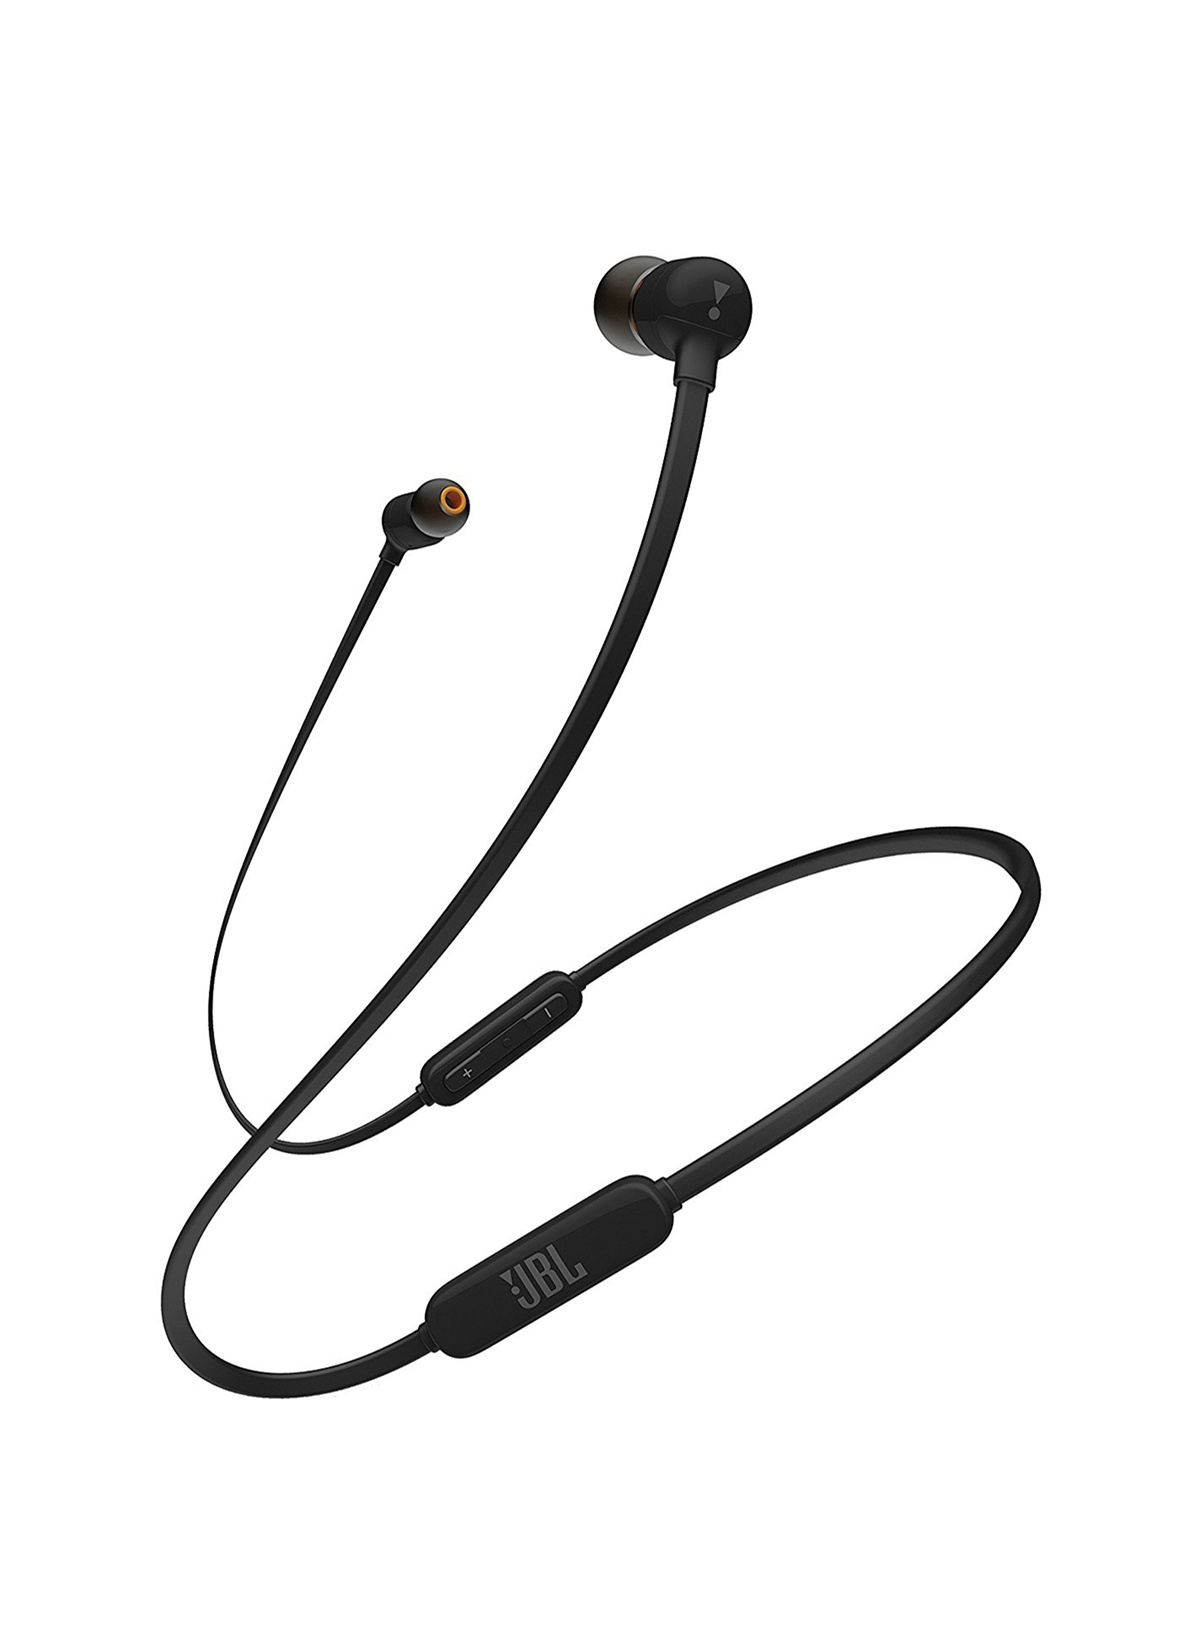 Standart JBL T110BT Siyah Wireless Bluetooth Kulak İçi Kulaklık